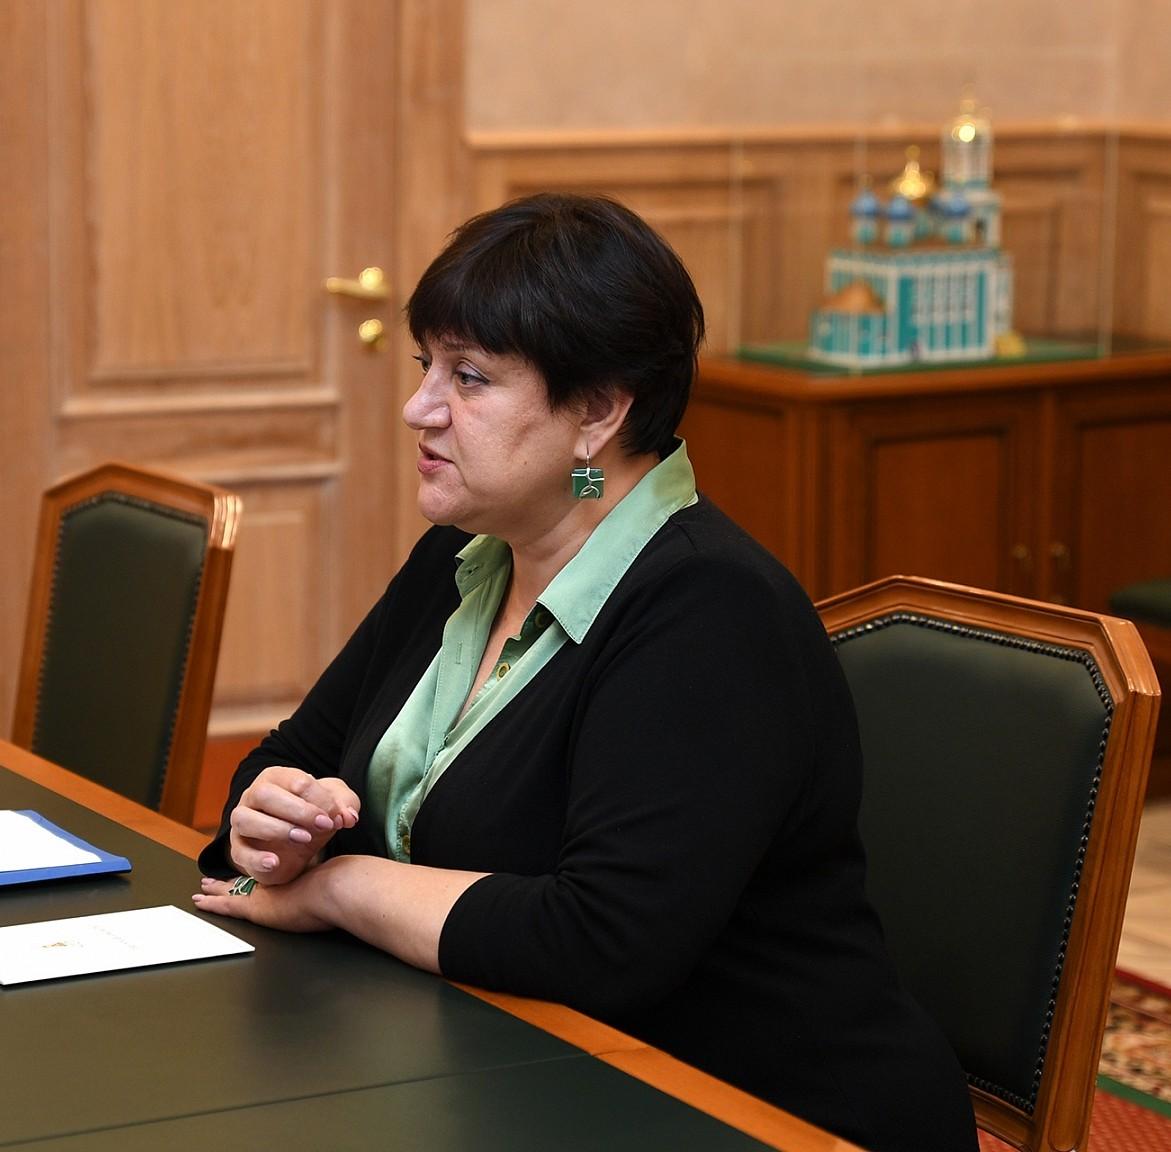 Наталья Виноградова: Задача такая: по светофору у каждой школы